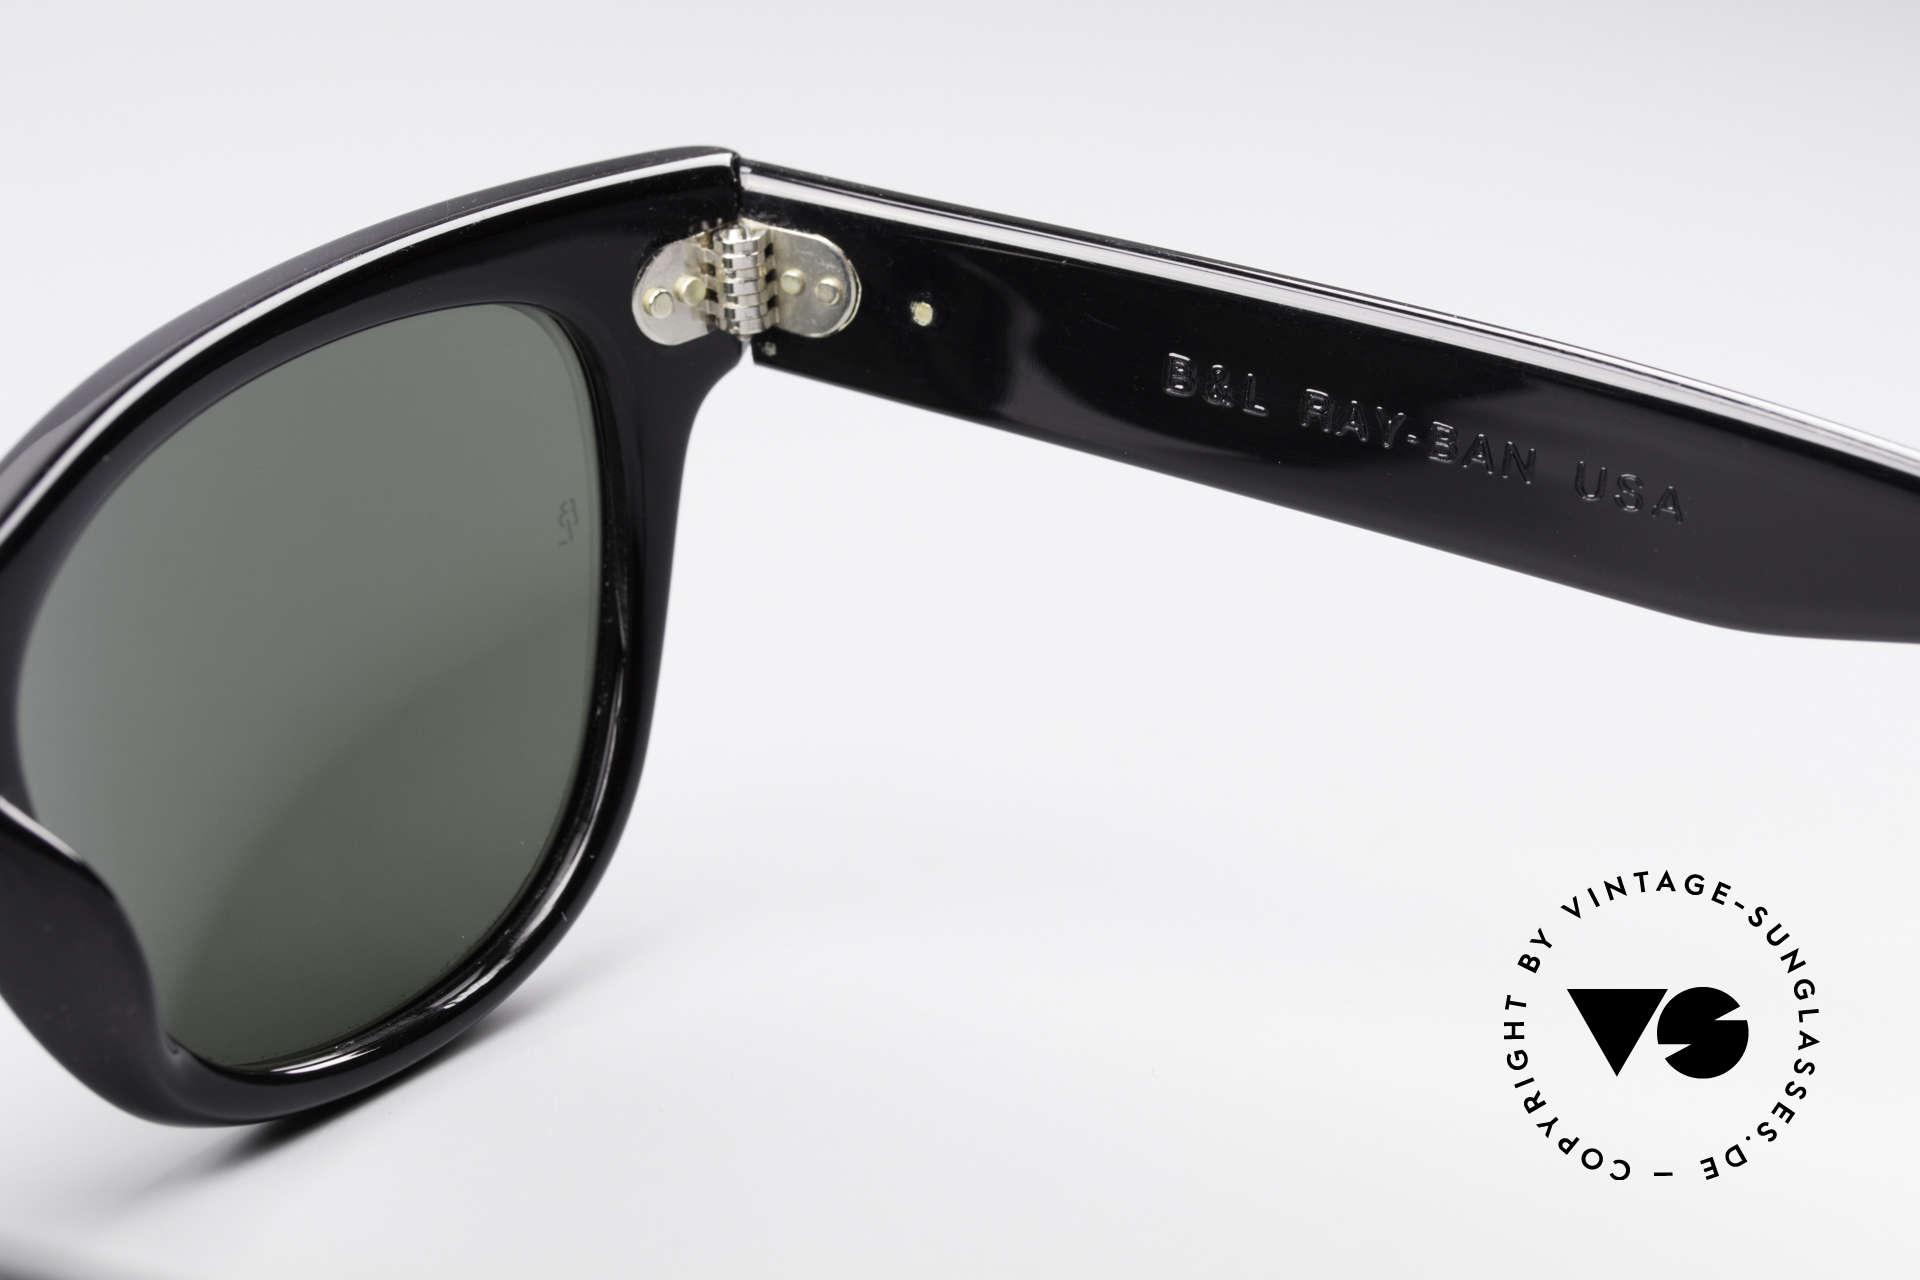 Ray Ban Laramie B&L Vintage Ladies Sunglasses, Size: large, Made for Women